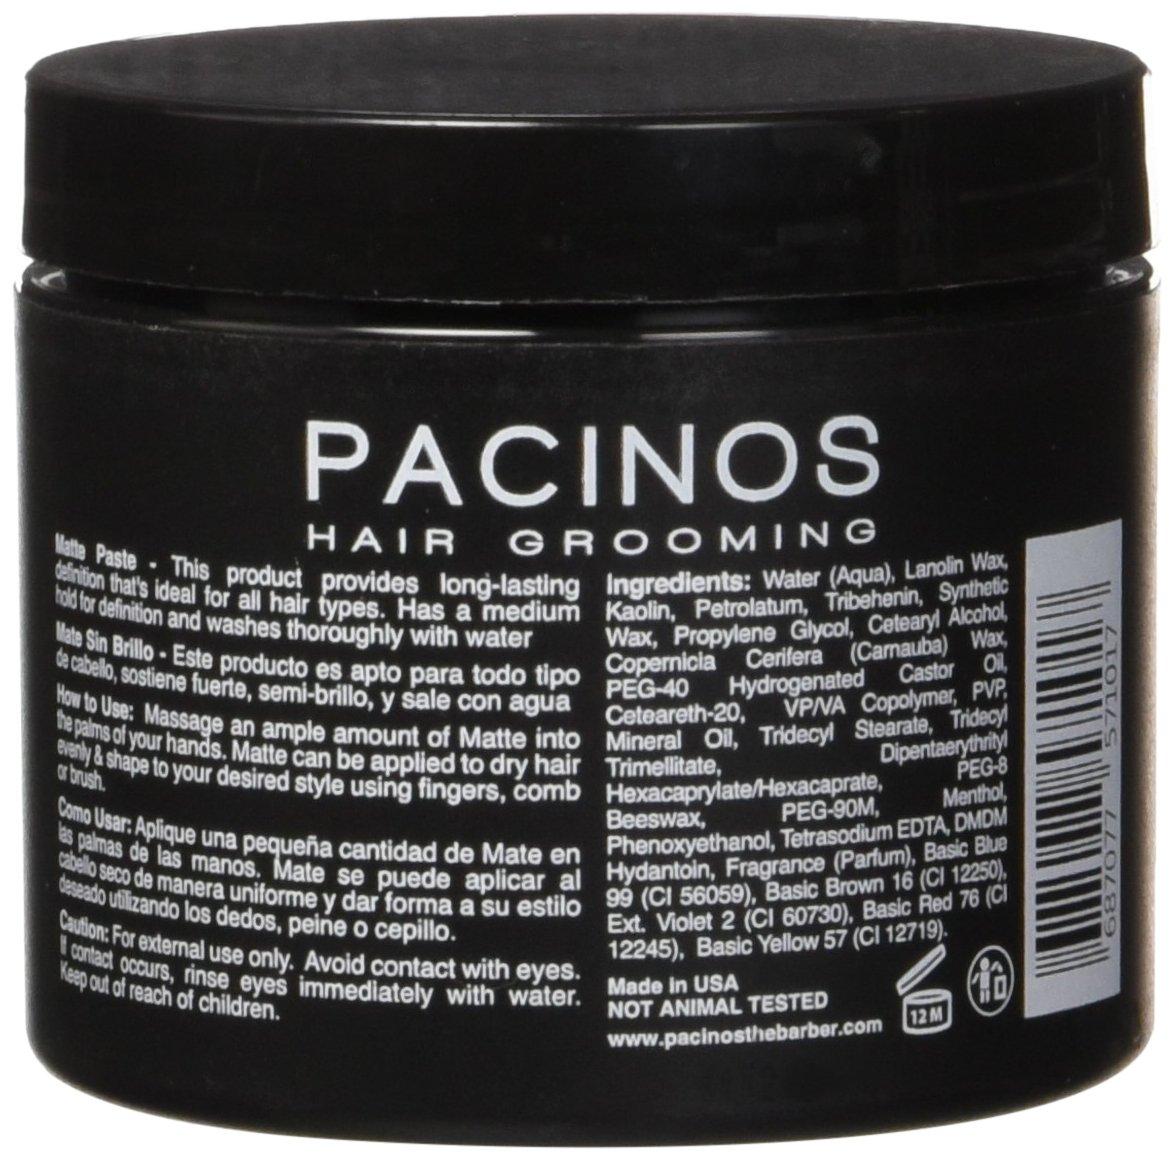 Pacinos Matte, 4 Ounce by Pacinos (Image #1)